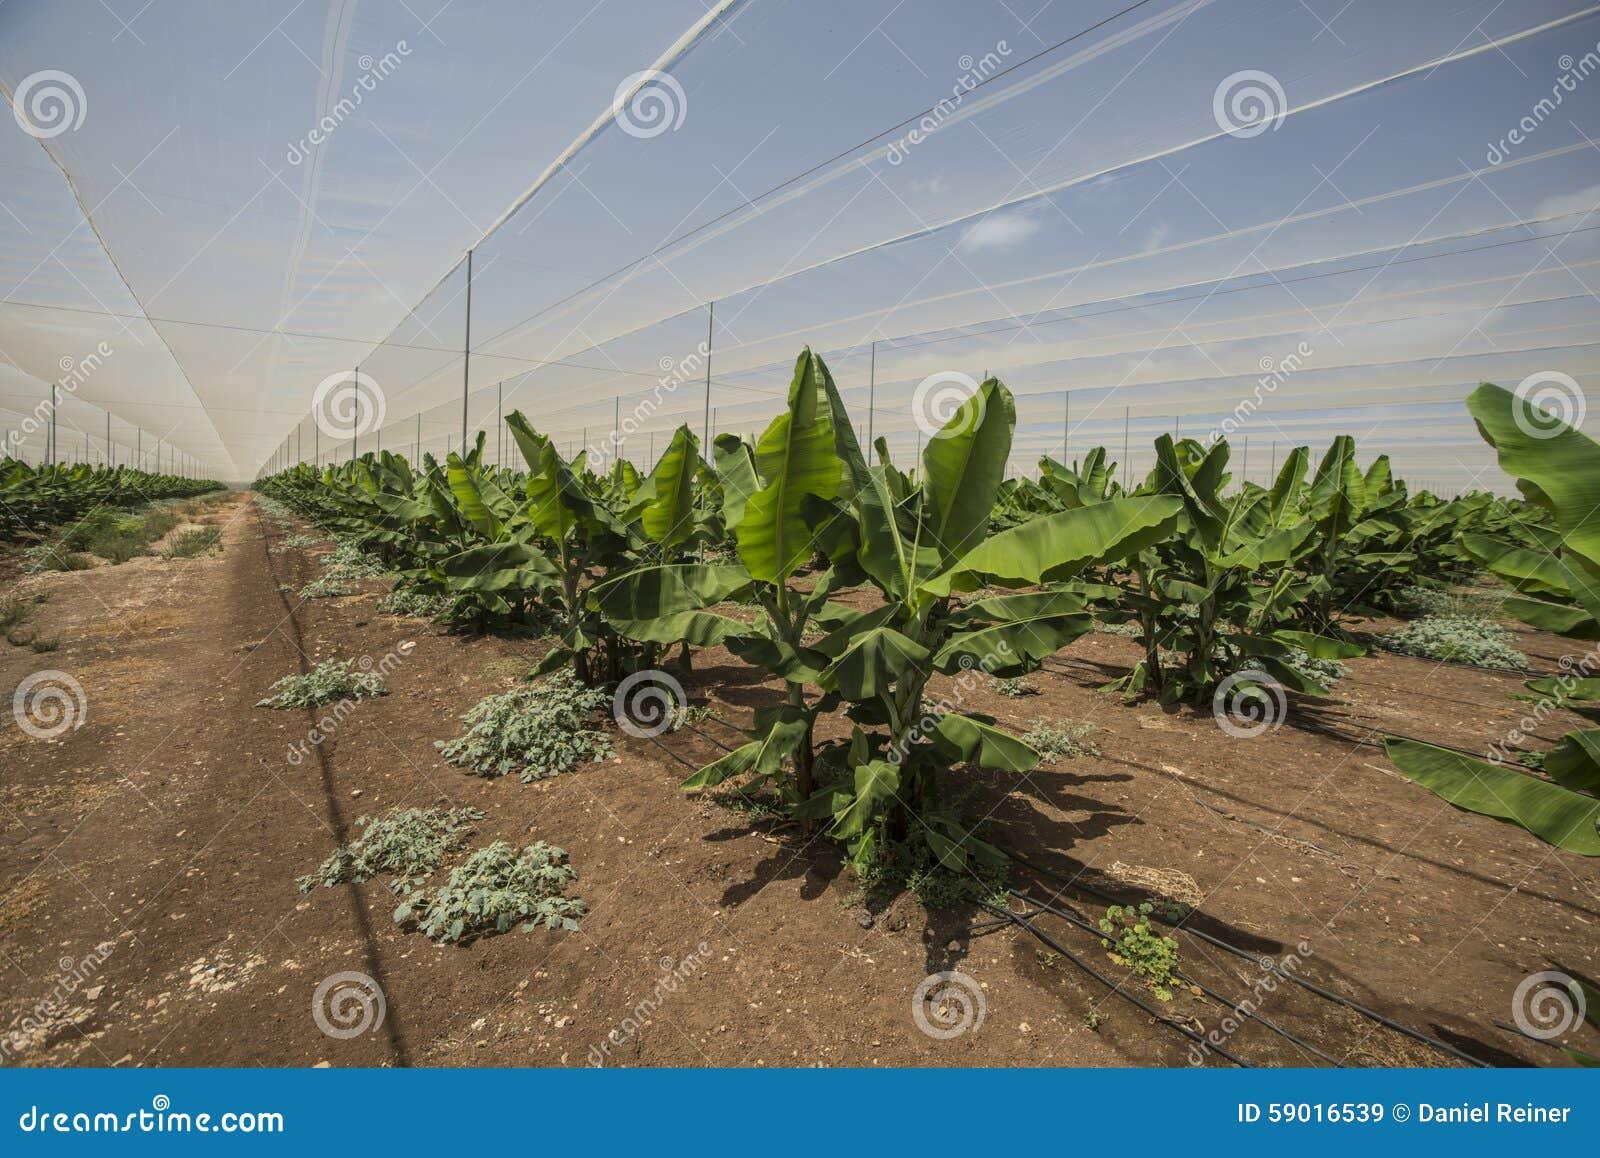 serre chaude de plantation de banane image stock image du liquide objets 59016539. Black Bedroom Furniture Sets. Home Design Ideas